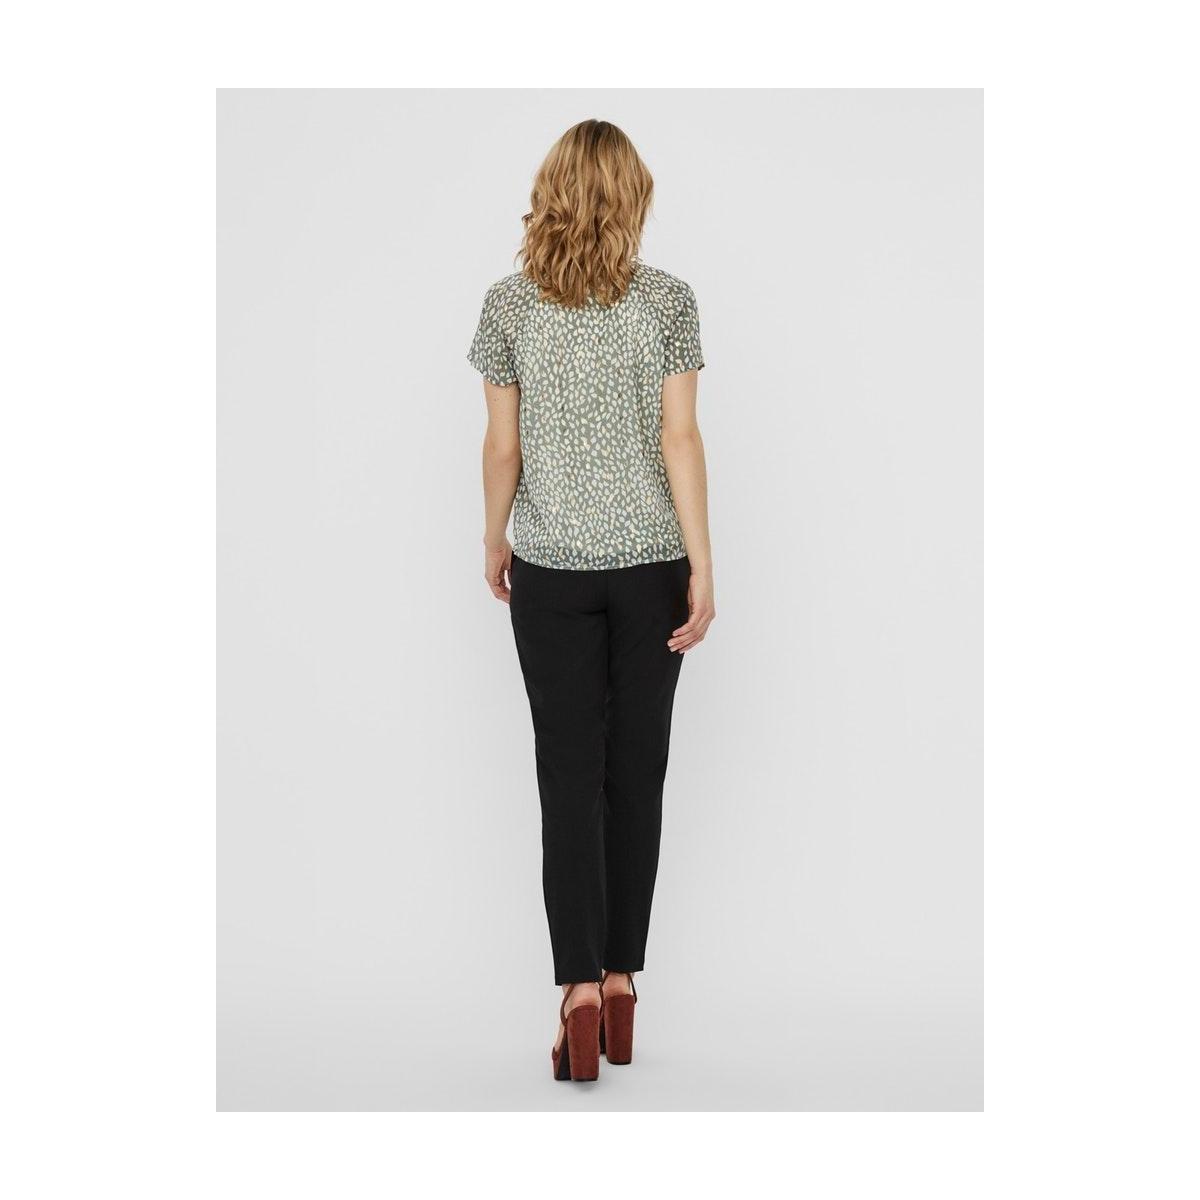 vmpenny s/s top wvn 10231205 vero moda t-shirt laurel wreath/penny